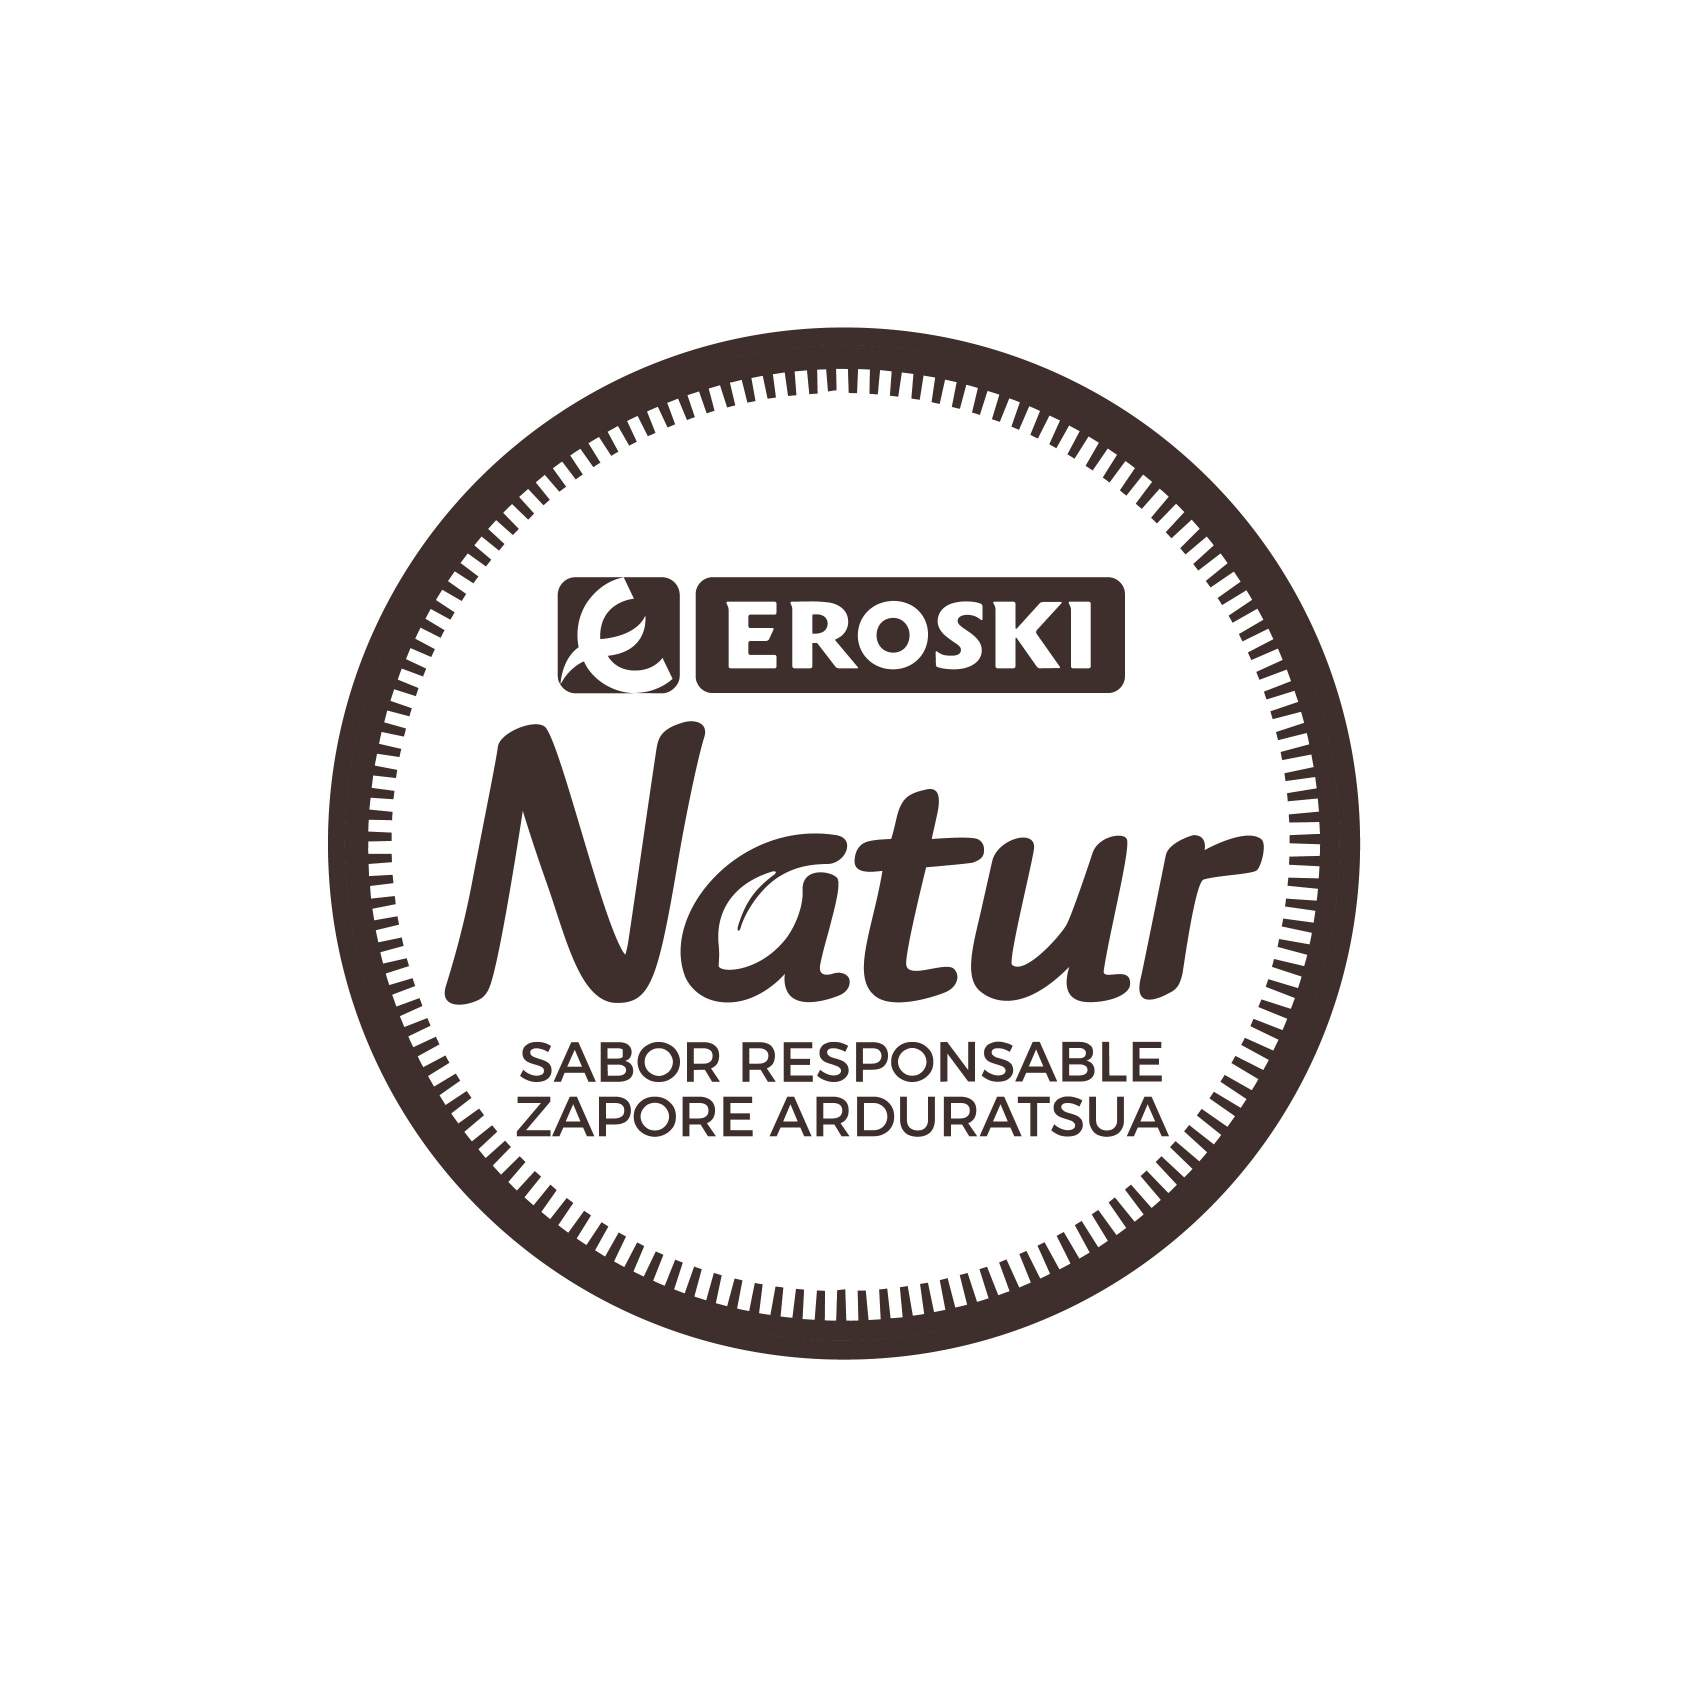 logo-natur-nuevo-germansfuster